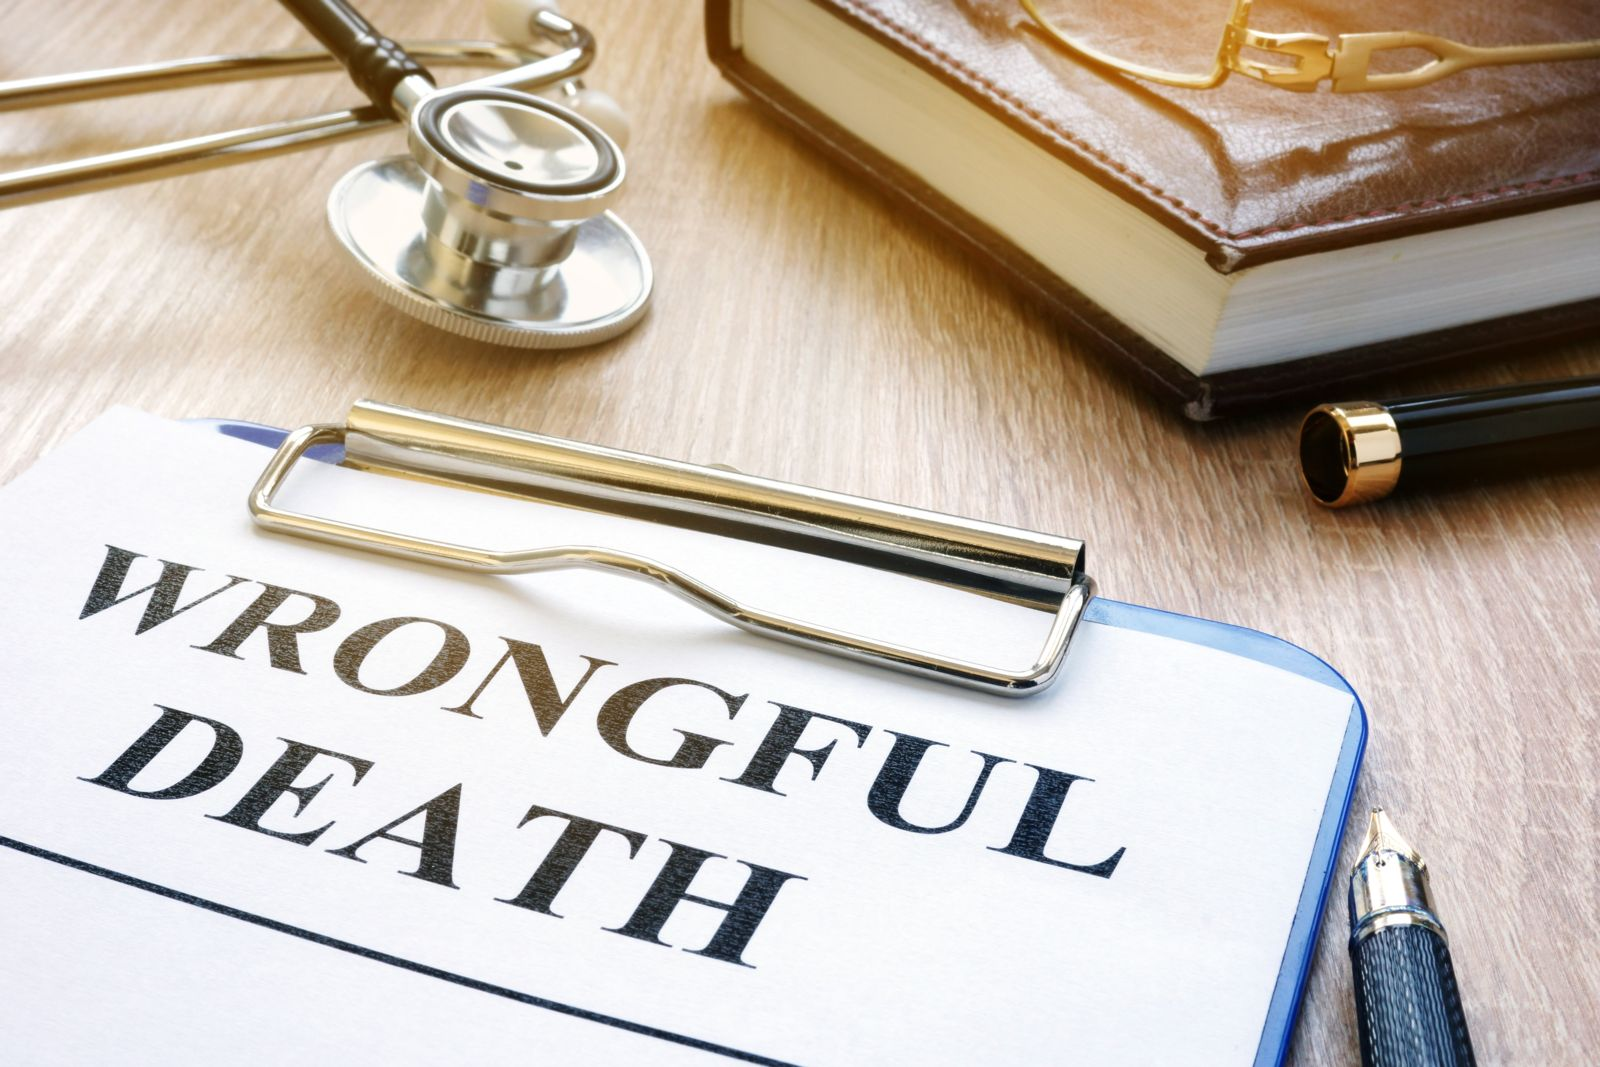 kansas city wrongful death attorneys